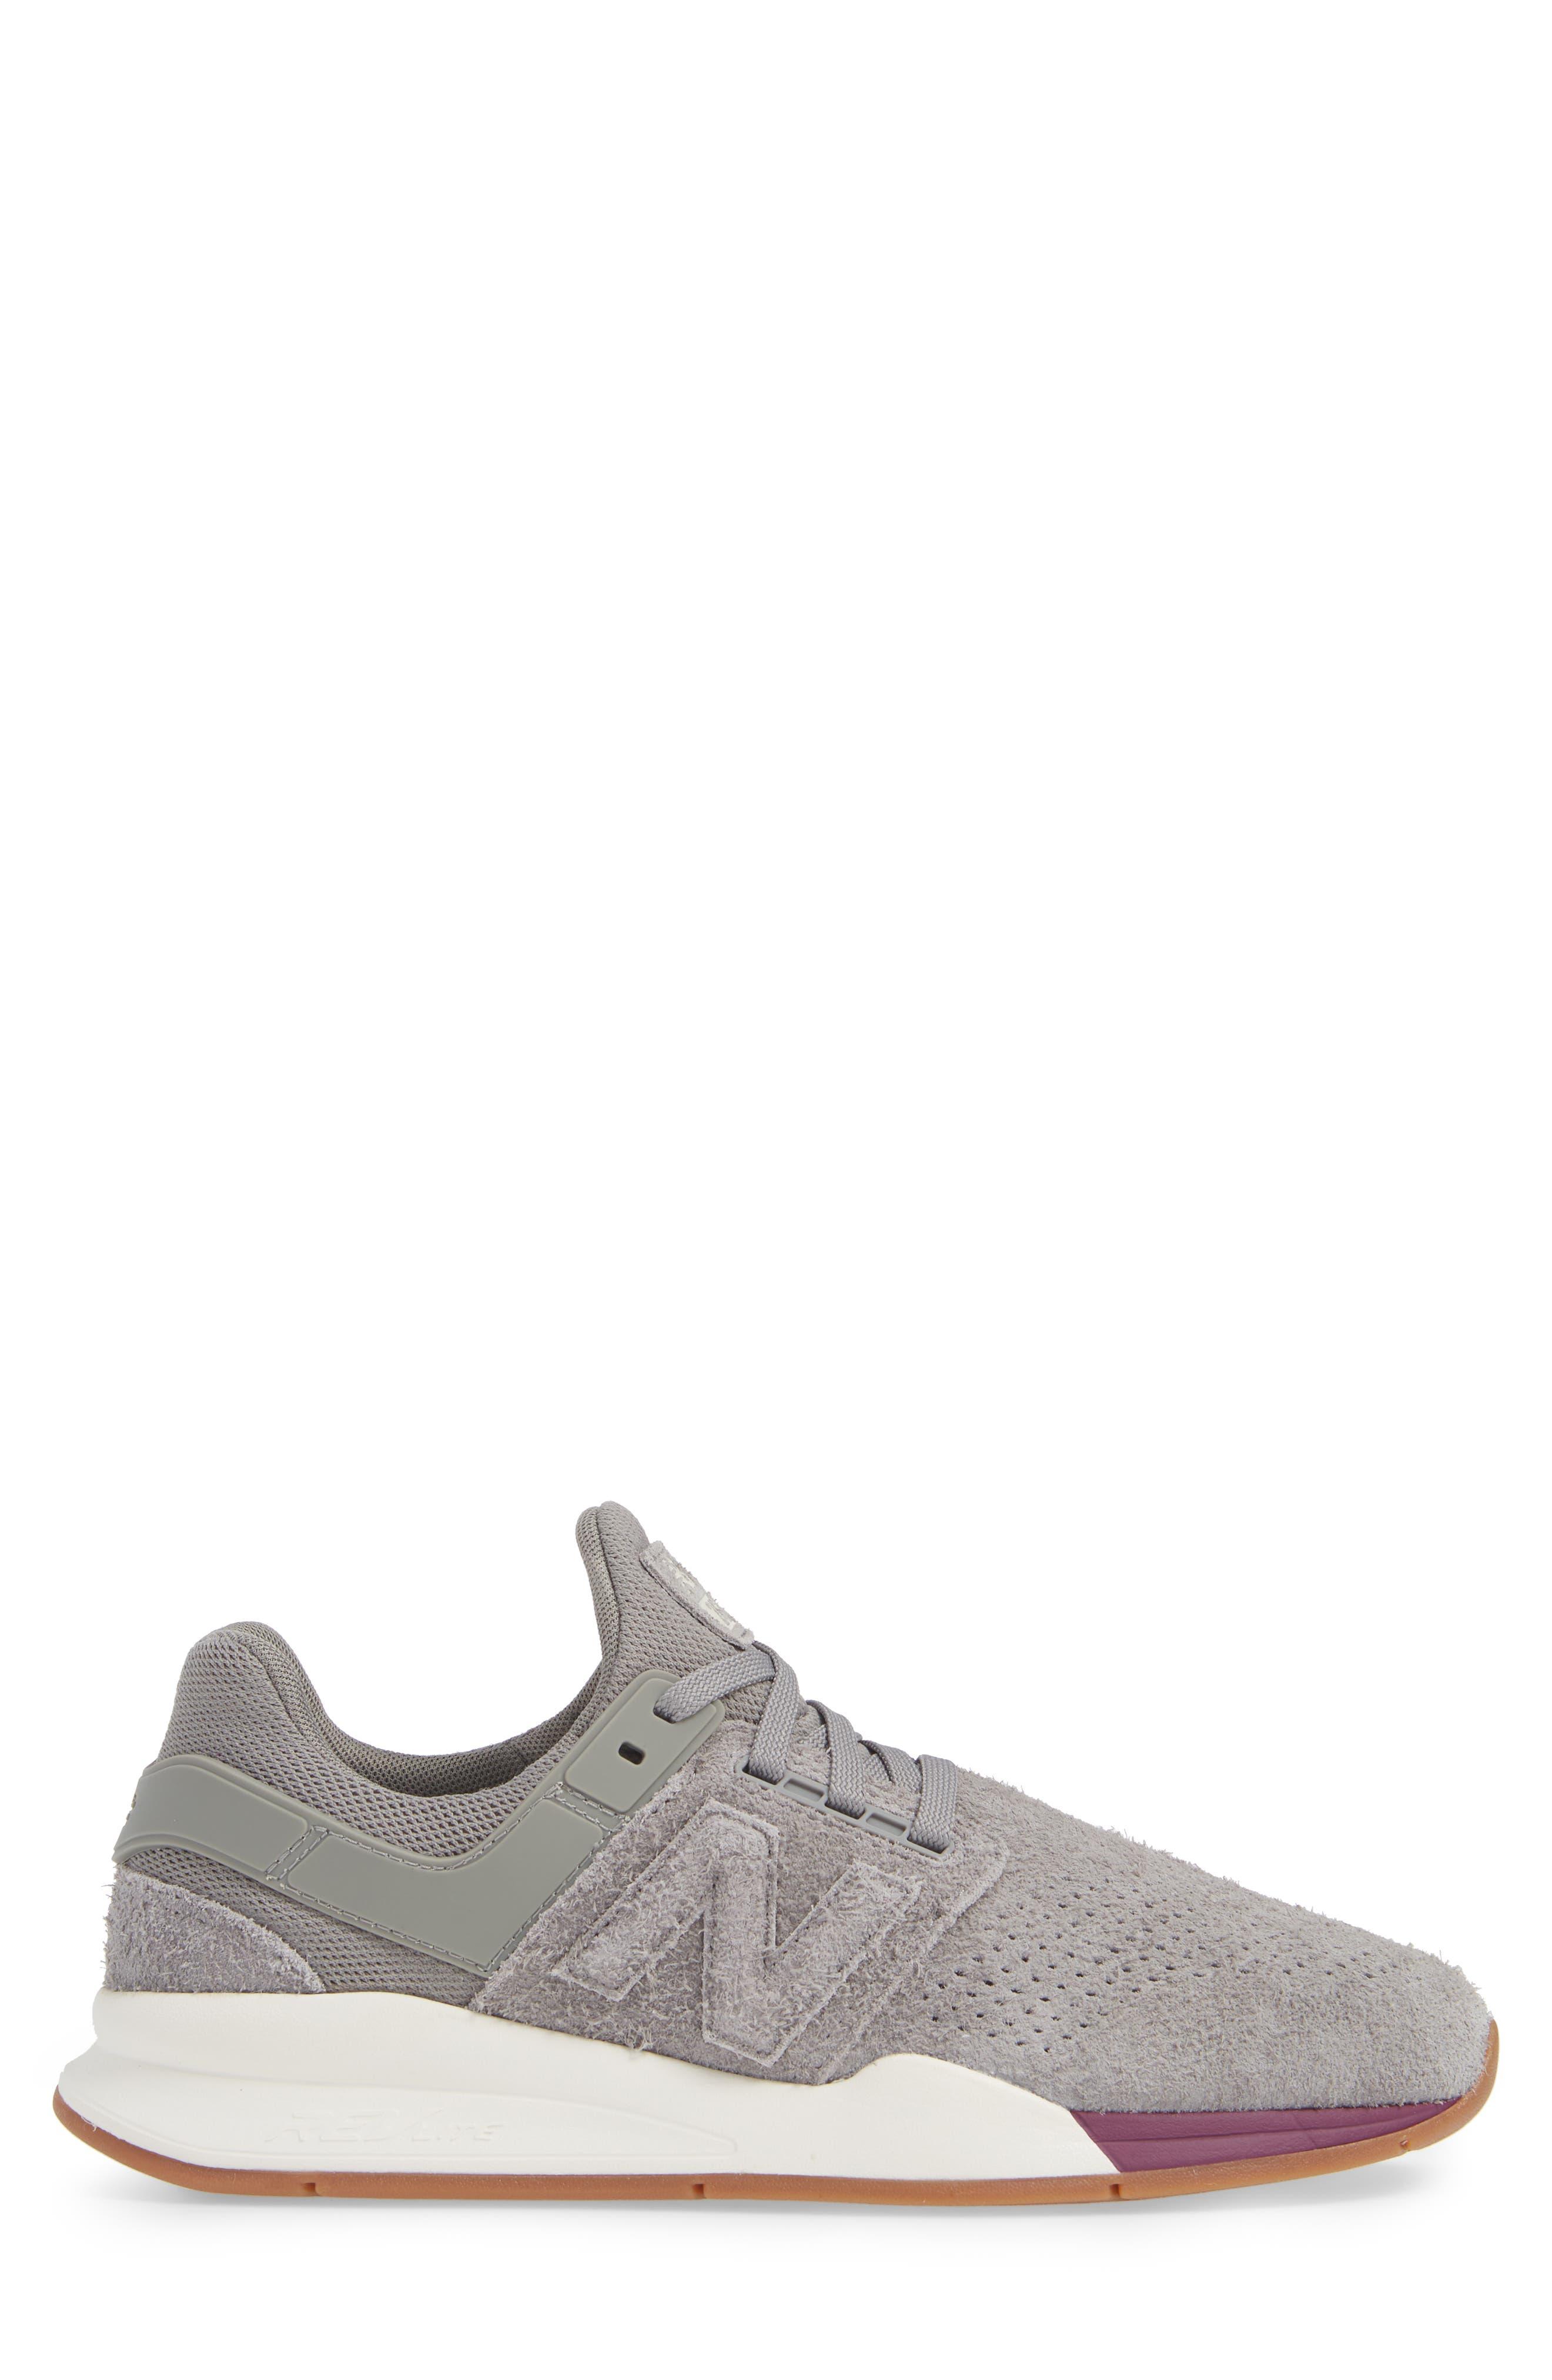 247 Suede Sneaker,                             Alternate thumbnail 3, color,                             MARBLEHEAD SUEDE